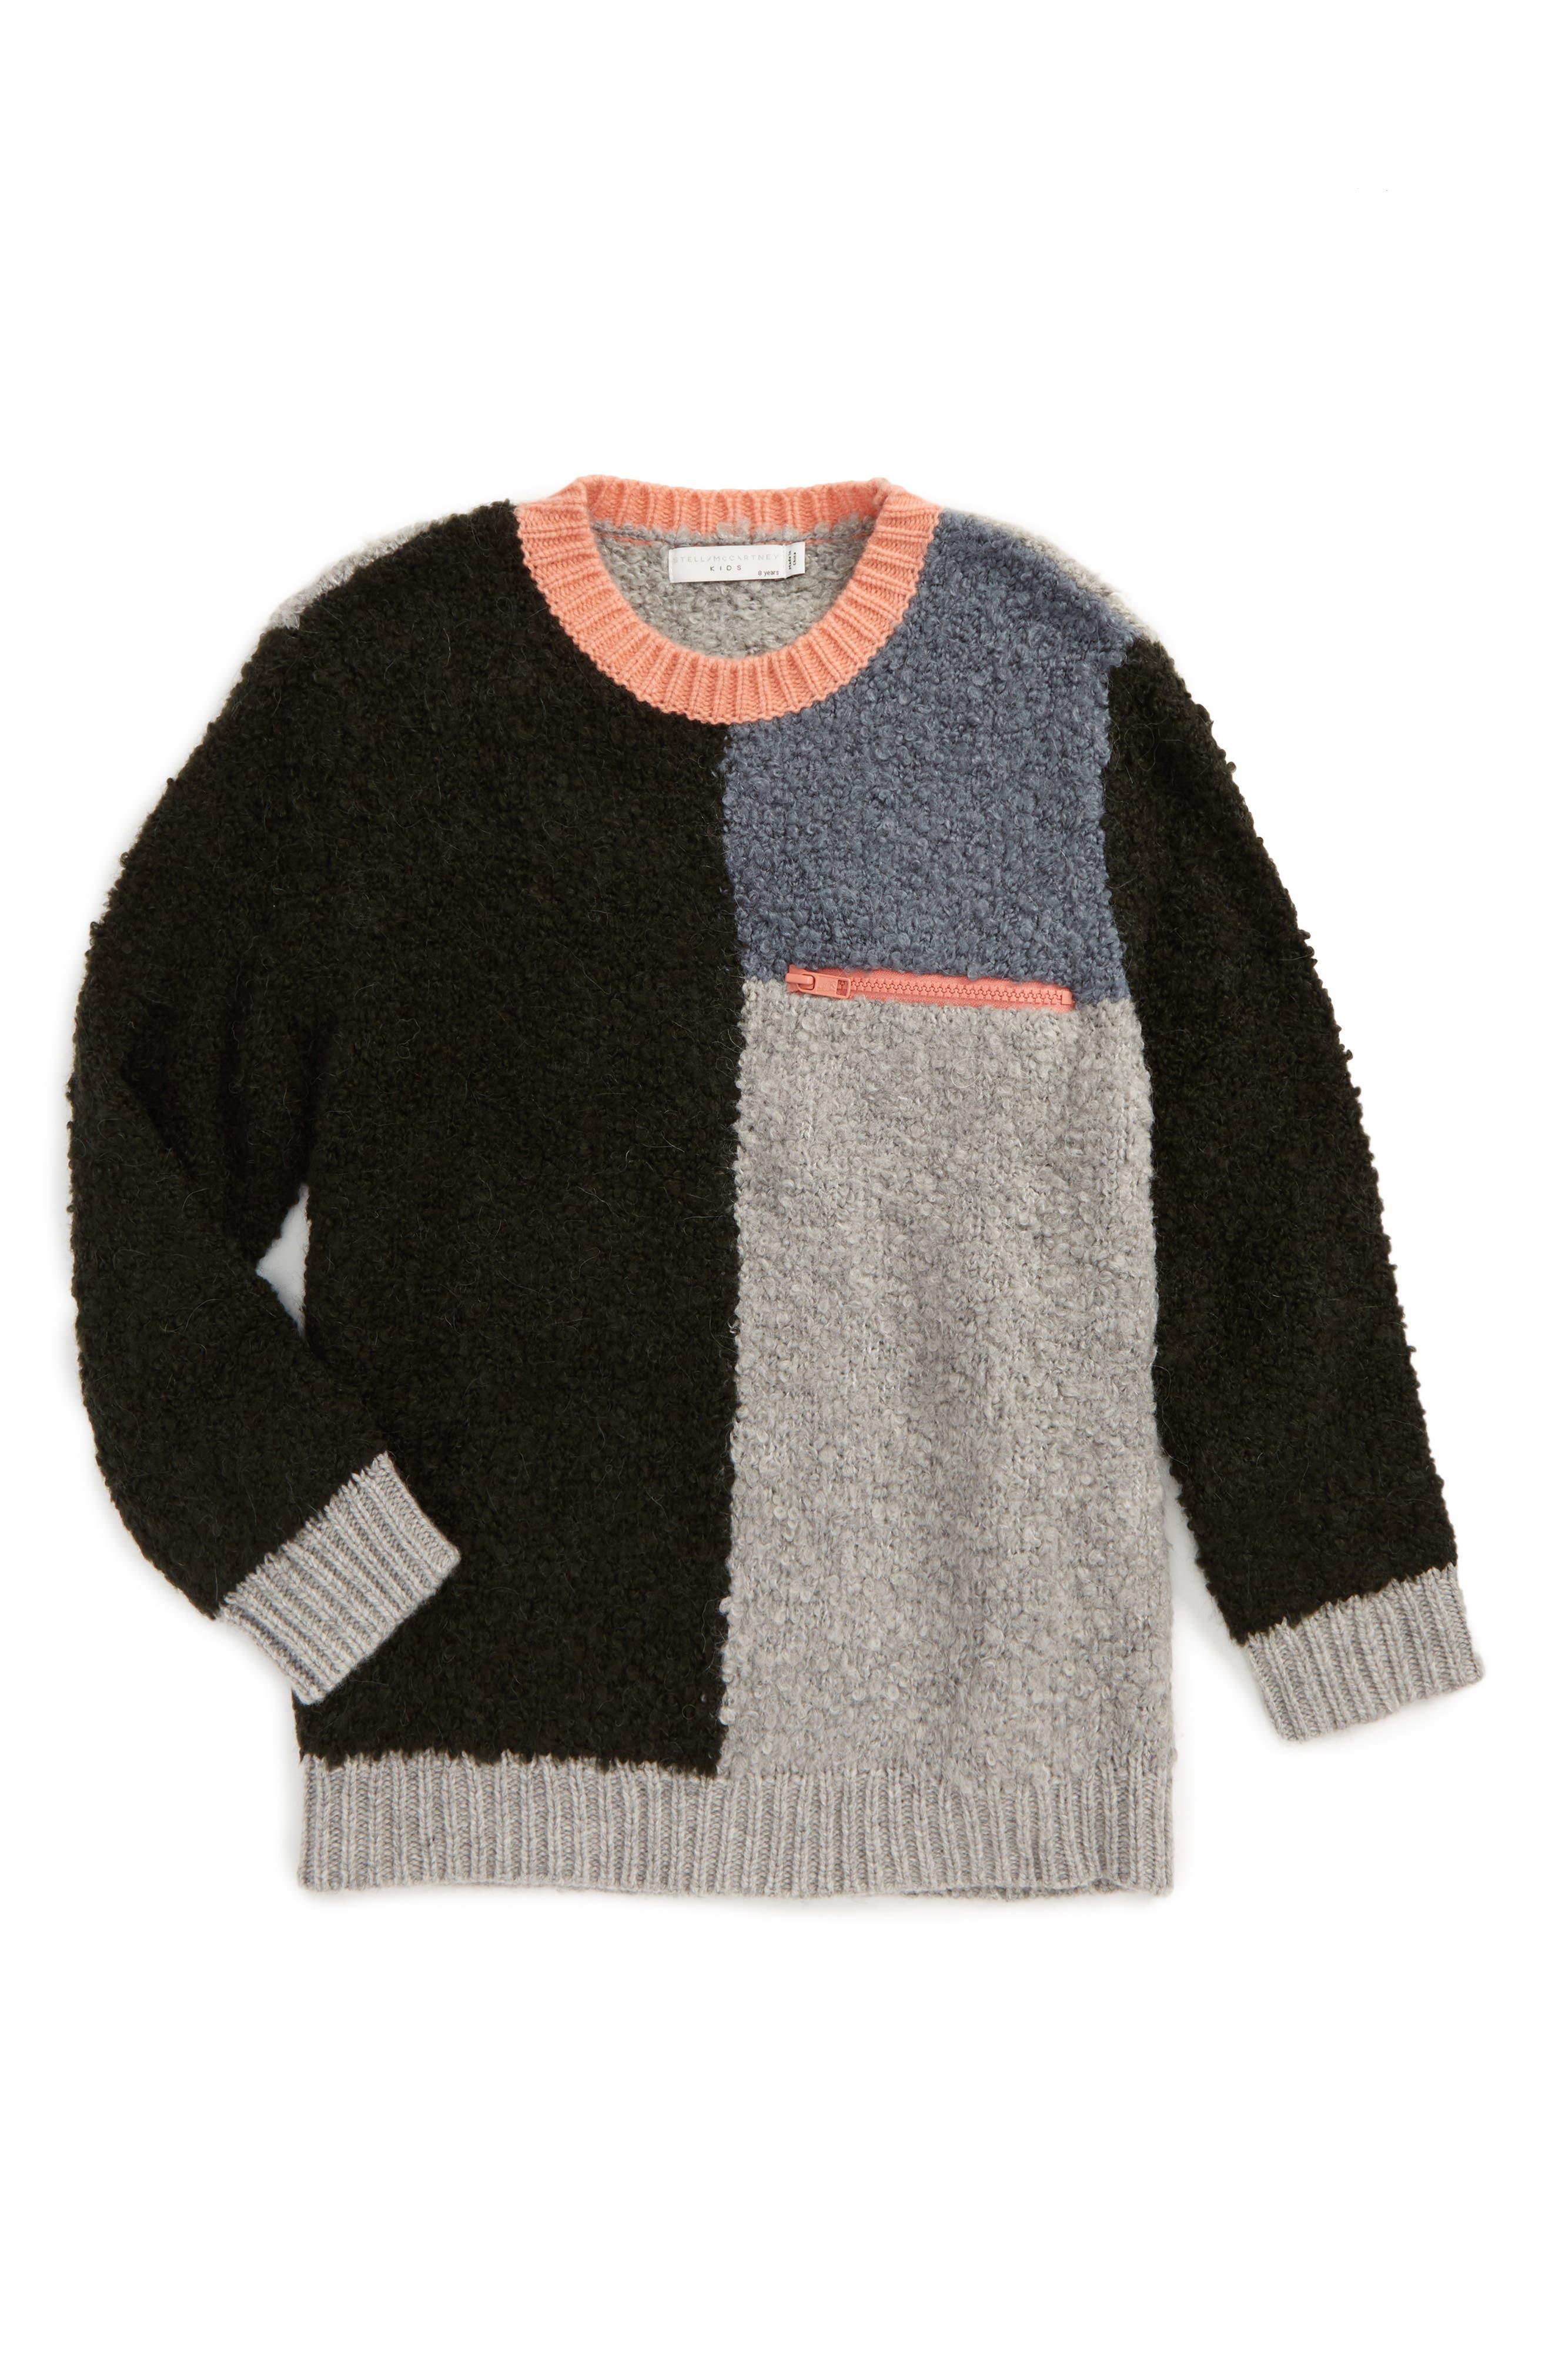 Kids Maya Colorblock Sweater,                             Main thumbnail 1, color,                             060